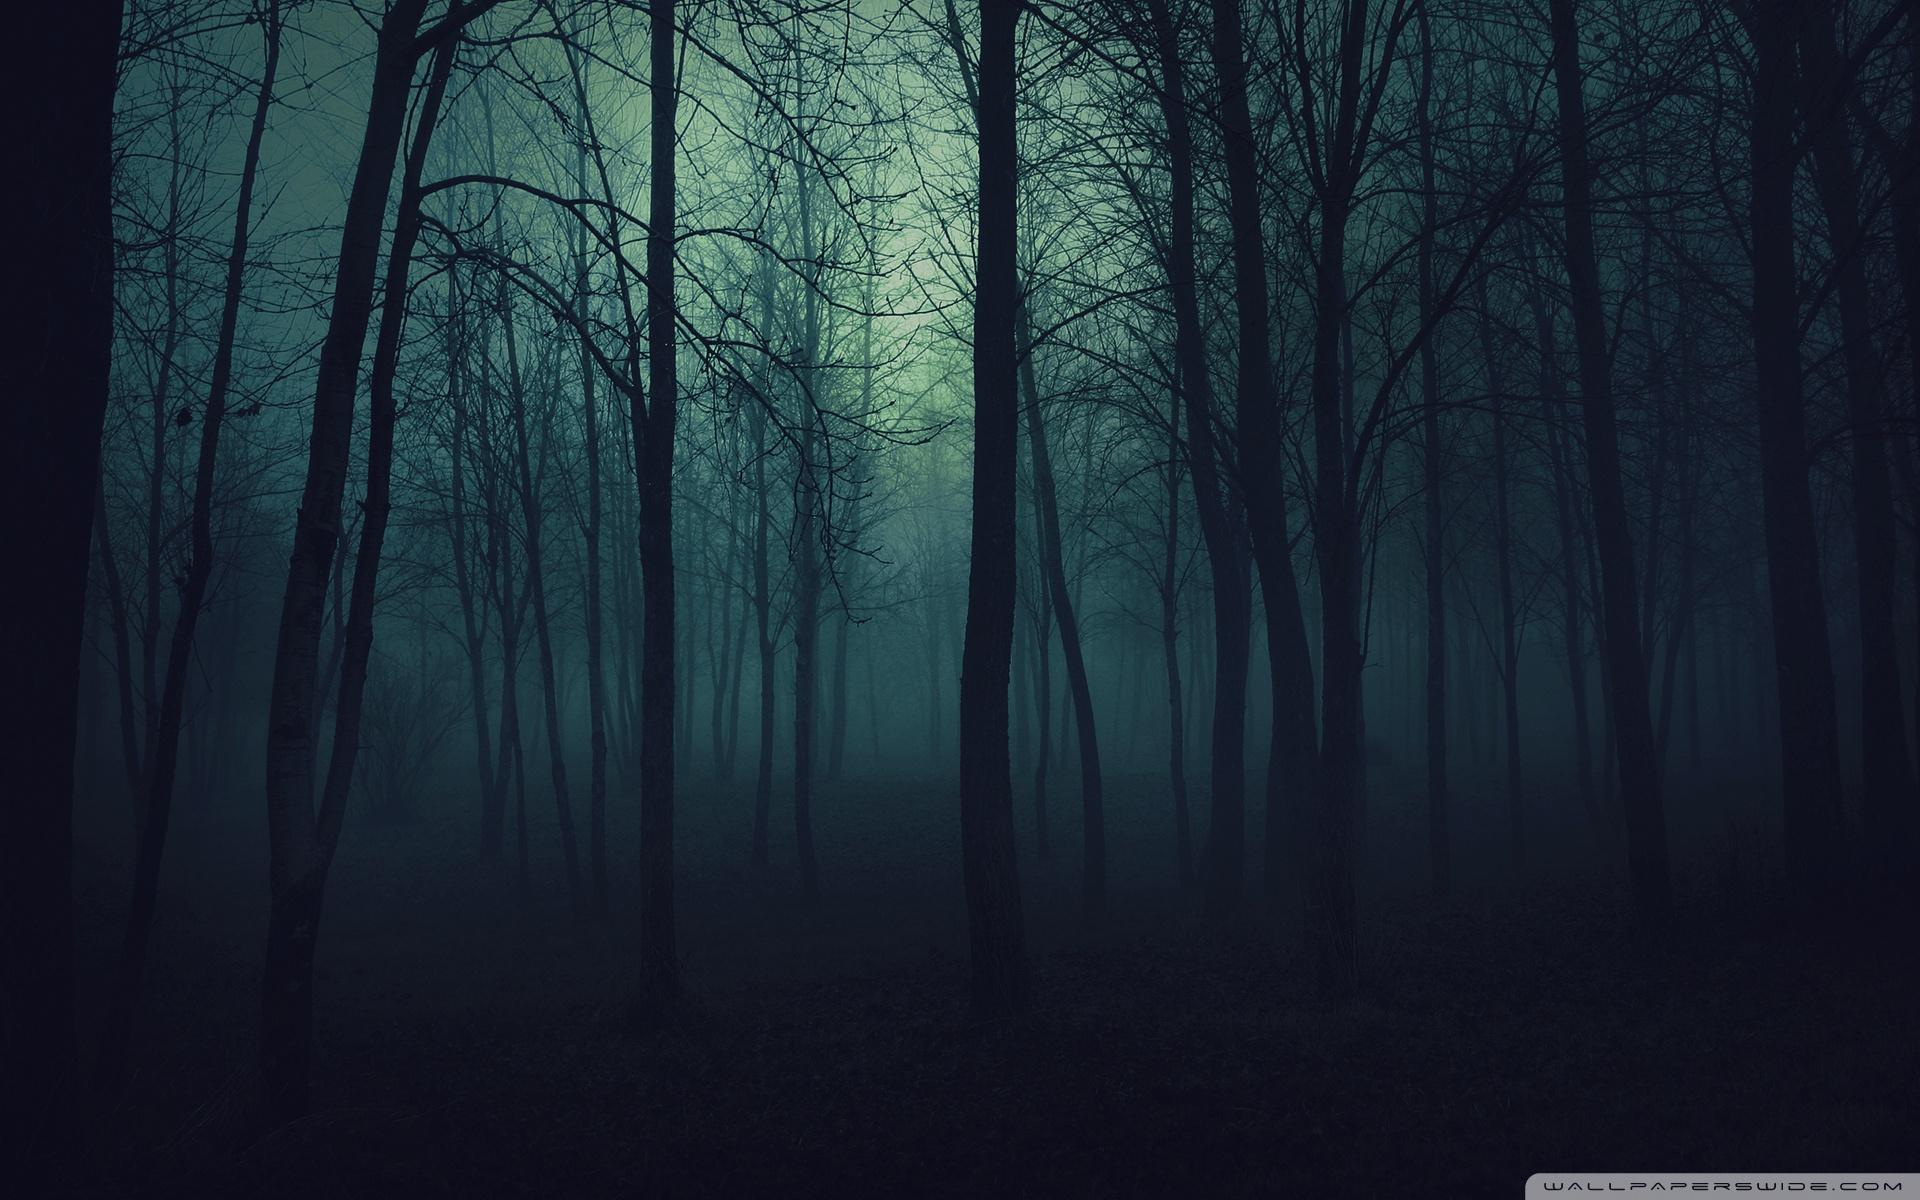 National Park clipart dark forest #3